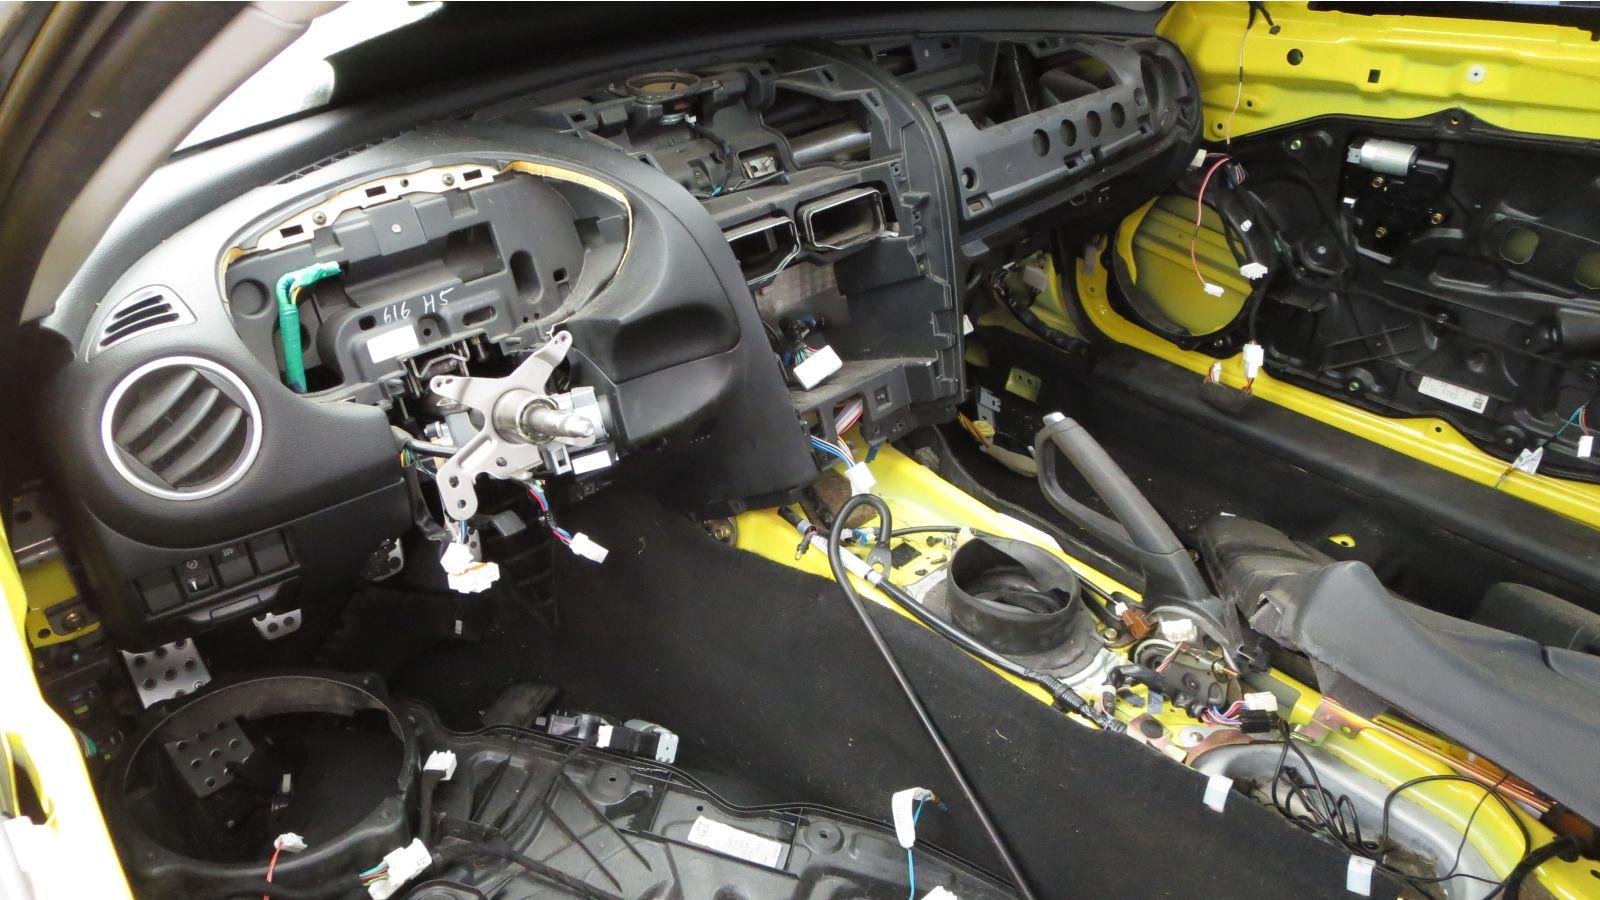 junkyard gem: 2004 mazda rx-8 - autoblog